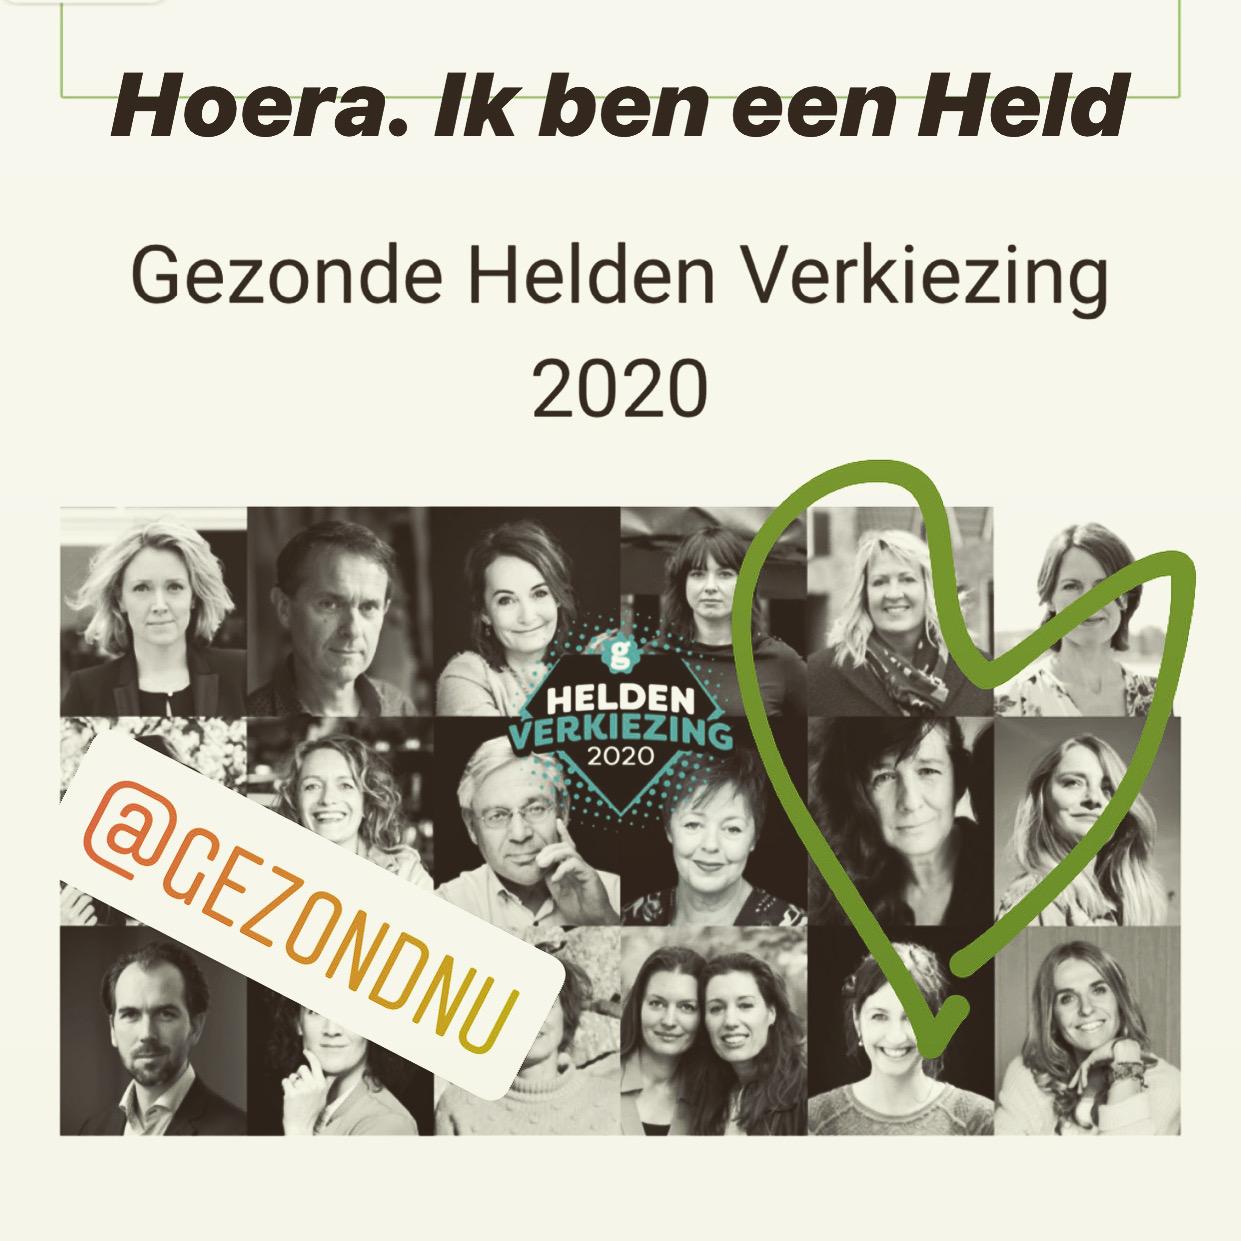 Nevejan is a Health Hero 2020